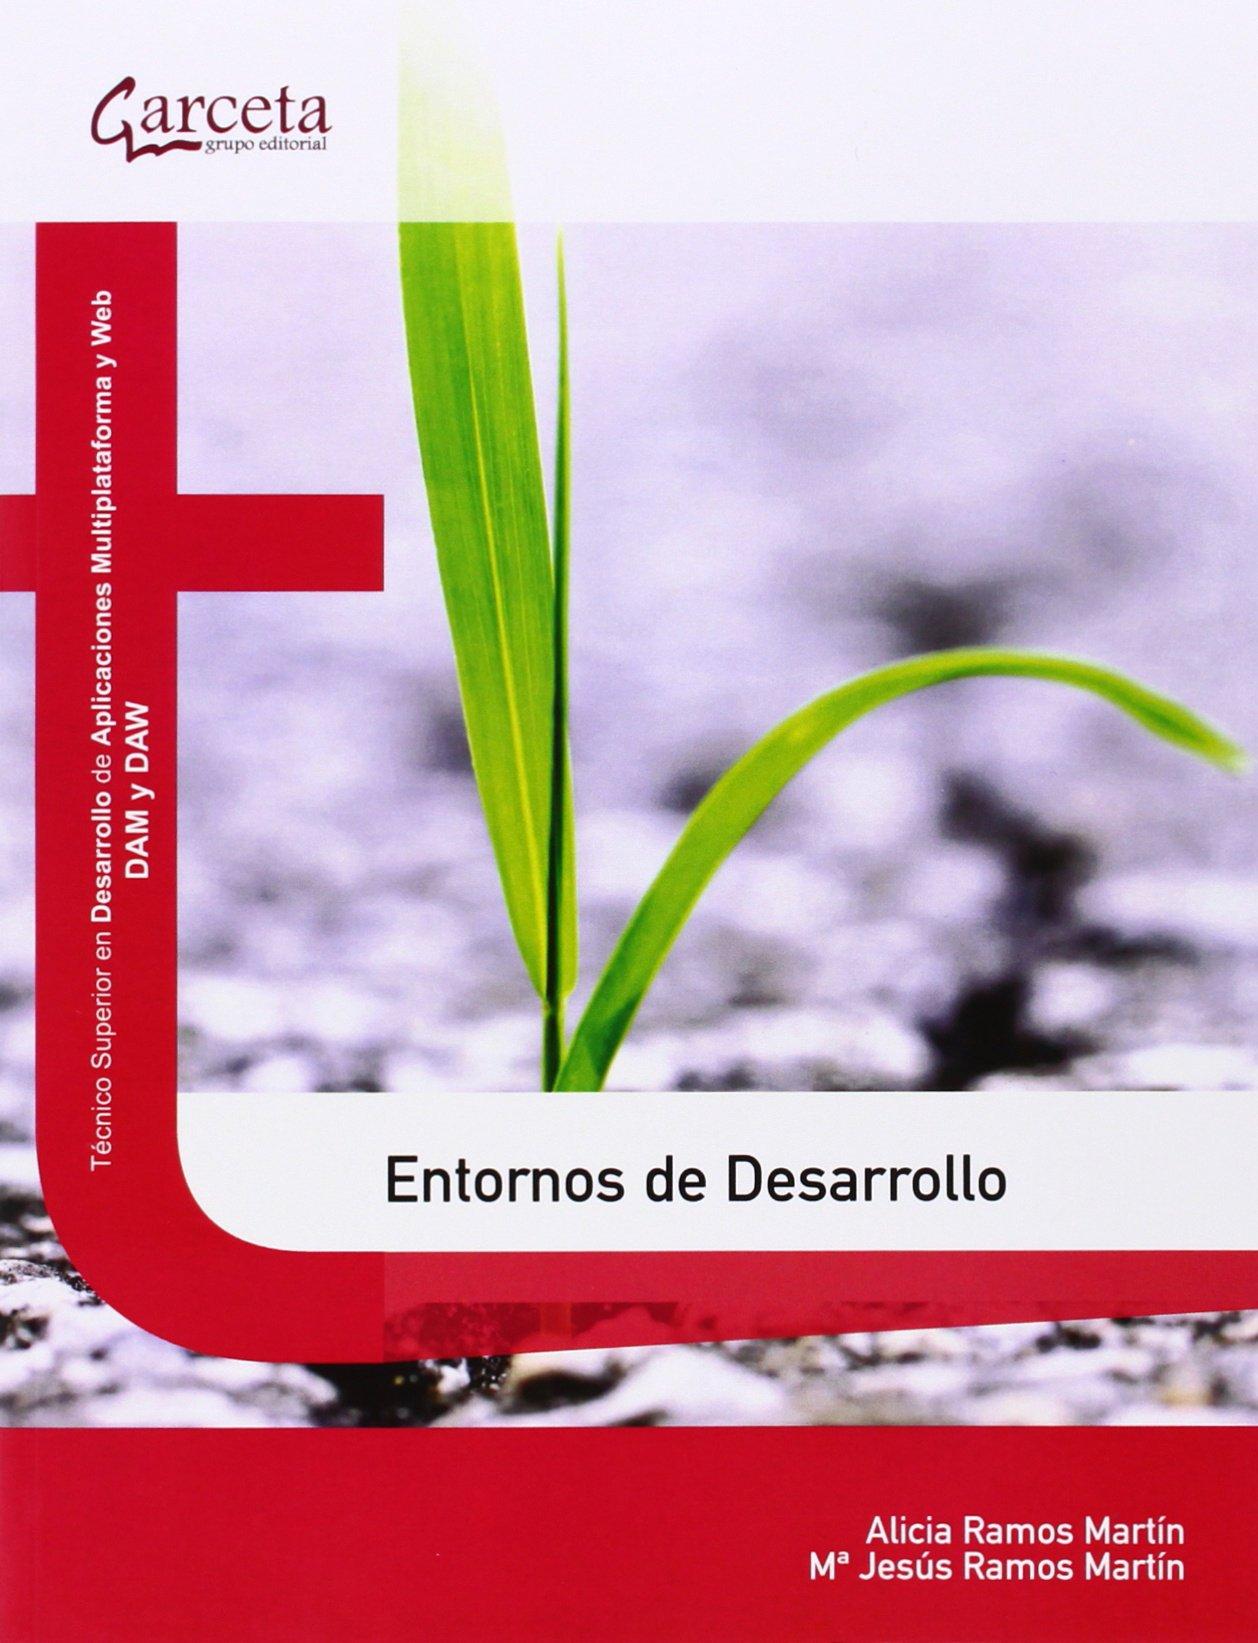 Entornos de desarrollo (Texto (garceta)) Tapa blanda – 9 ene 2014 Alicia Ramos Martín Mª Jesús Ramos Martín 8415452977 Operating systems